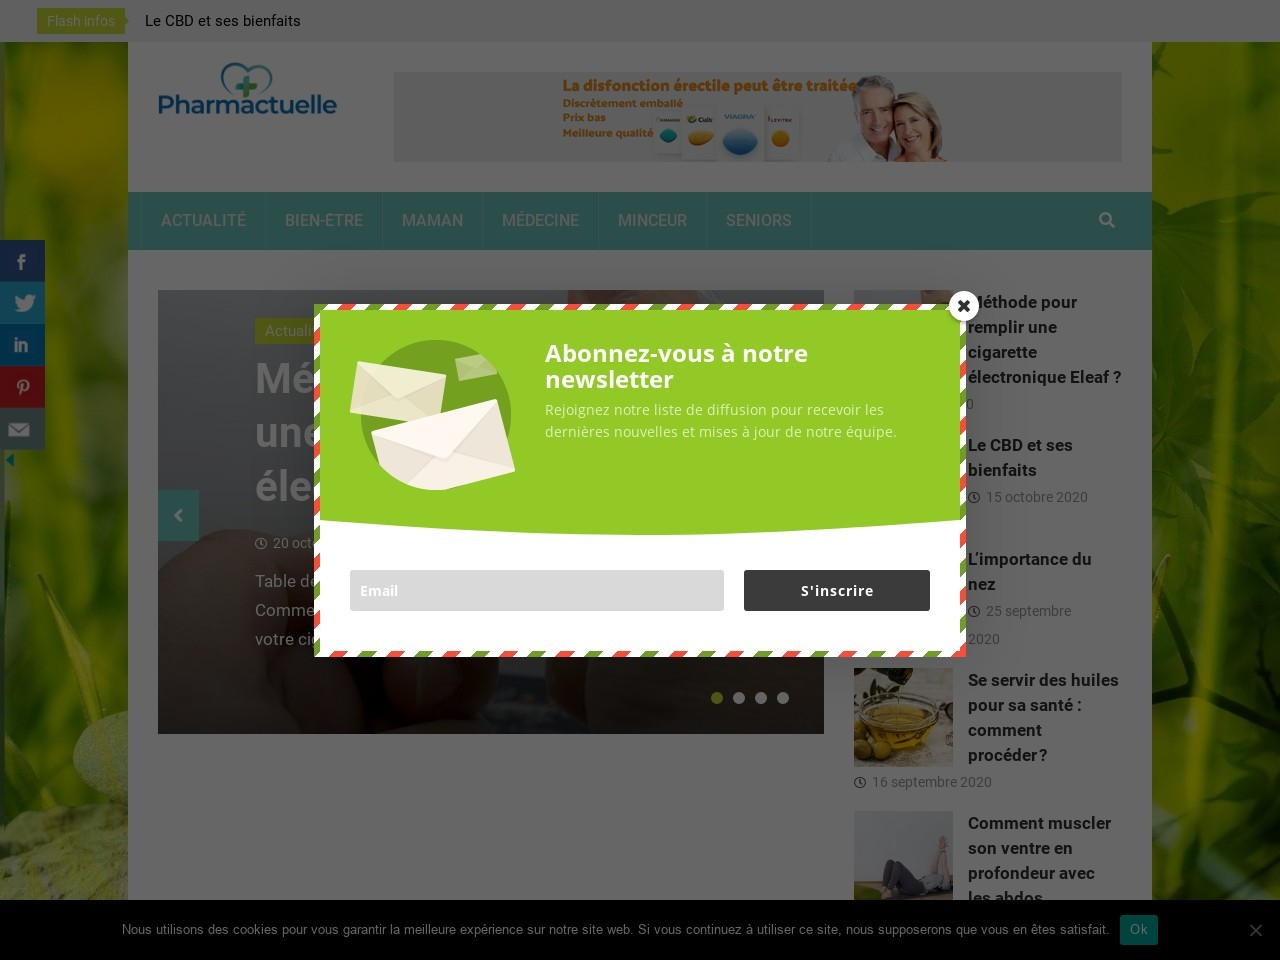 pharmactuelle.fr